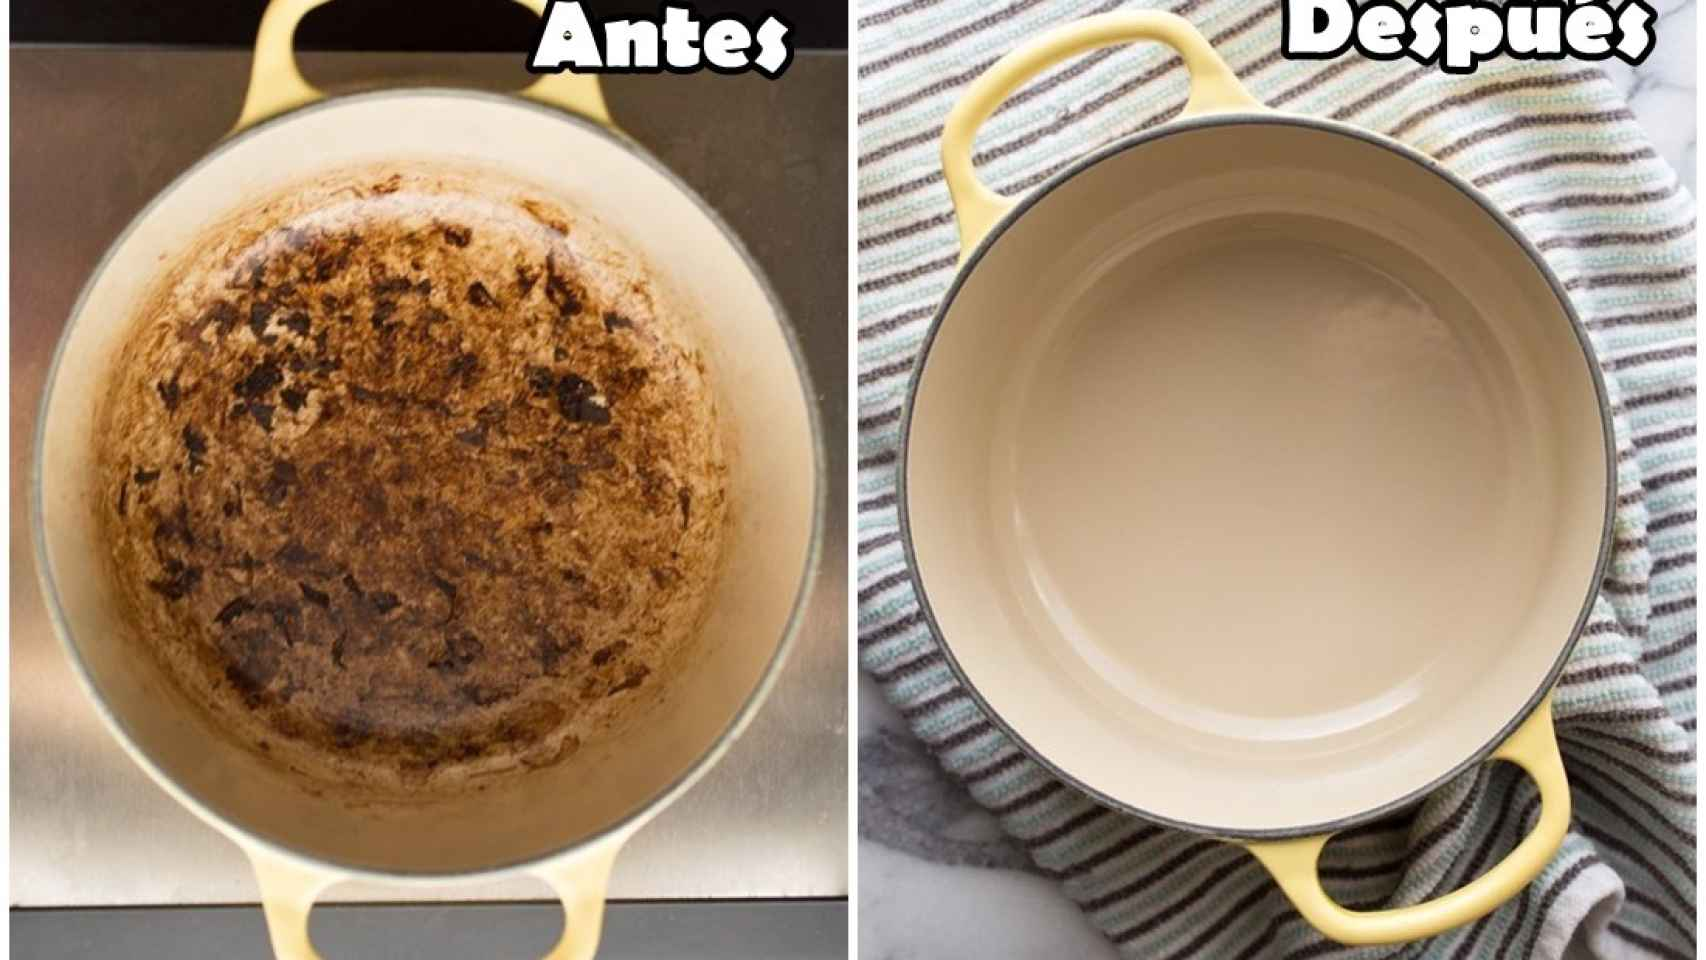 limpiar una olla quemada